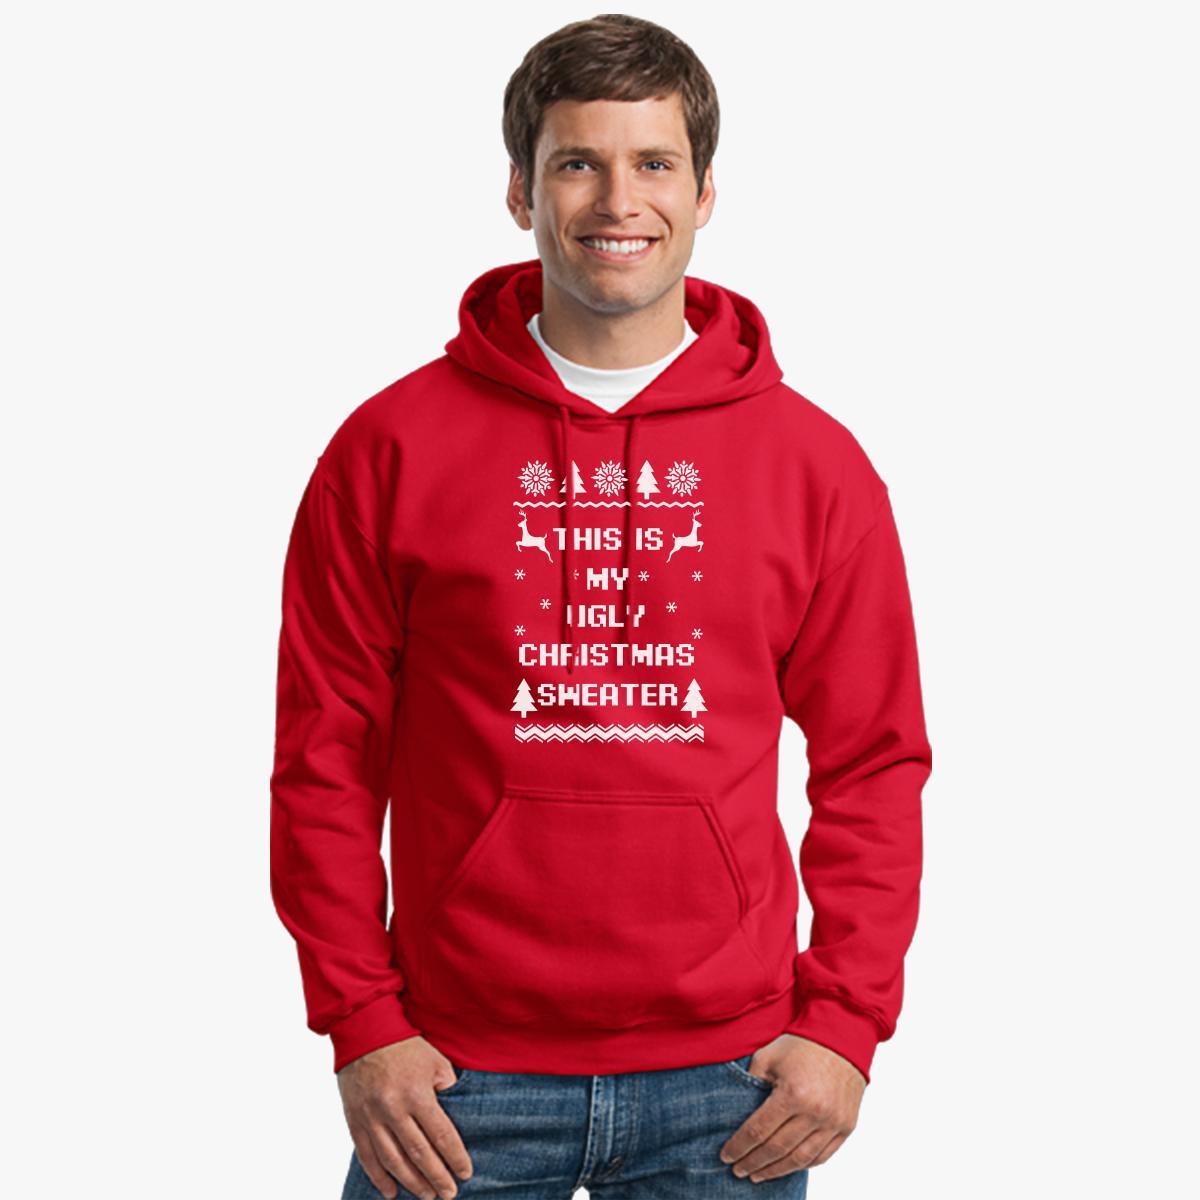 This is my ugly christmas sweater Hoodie | Customon.com